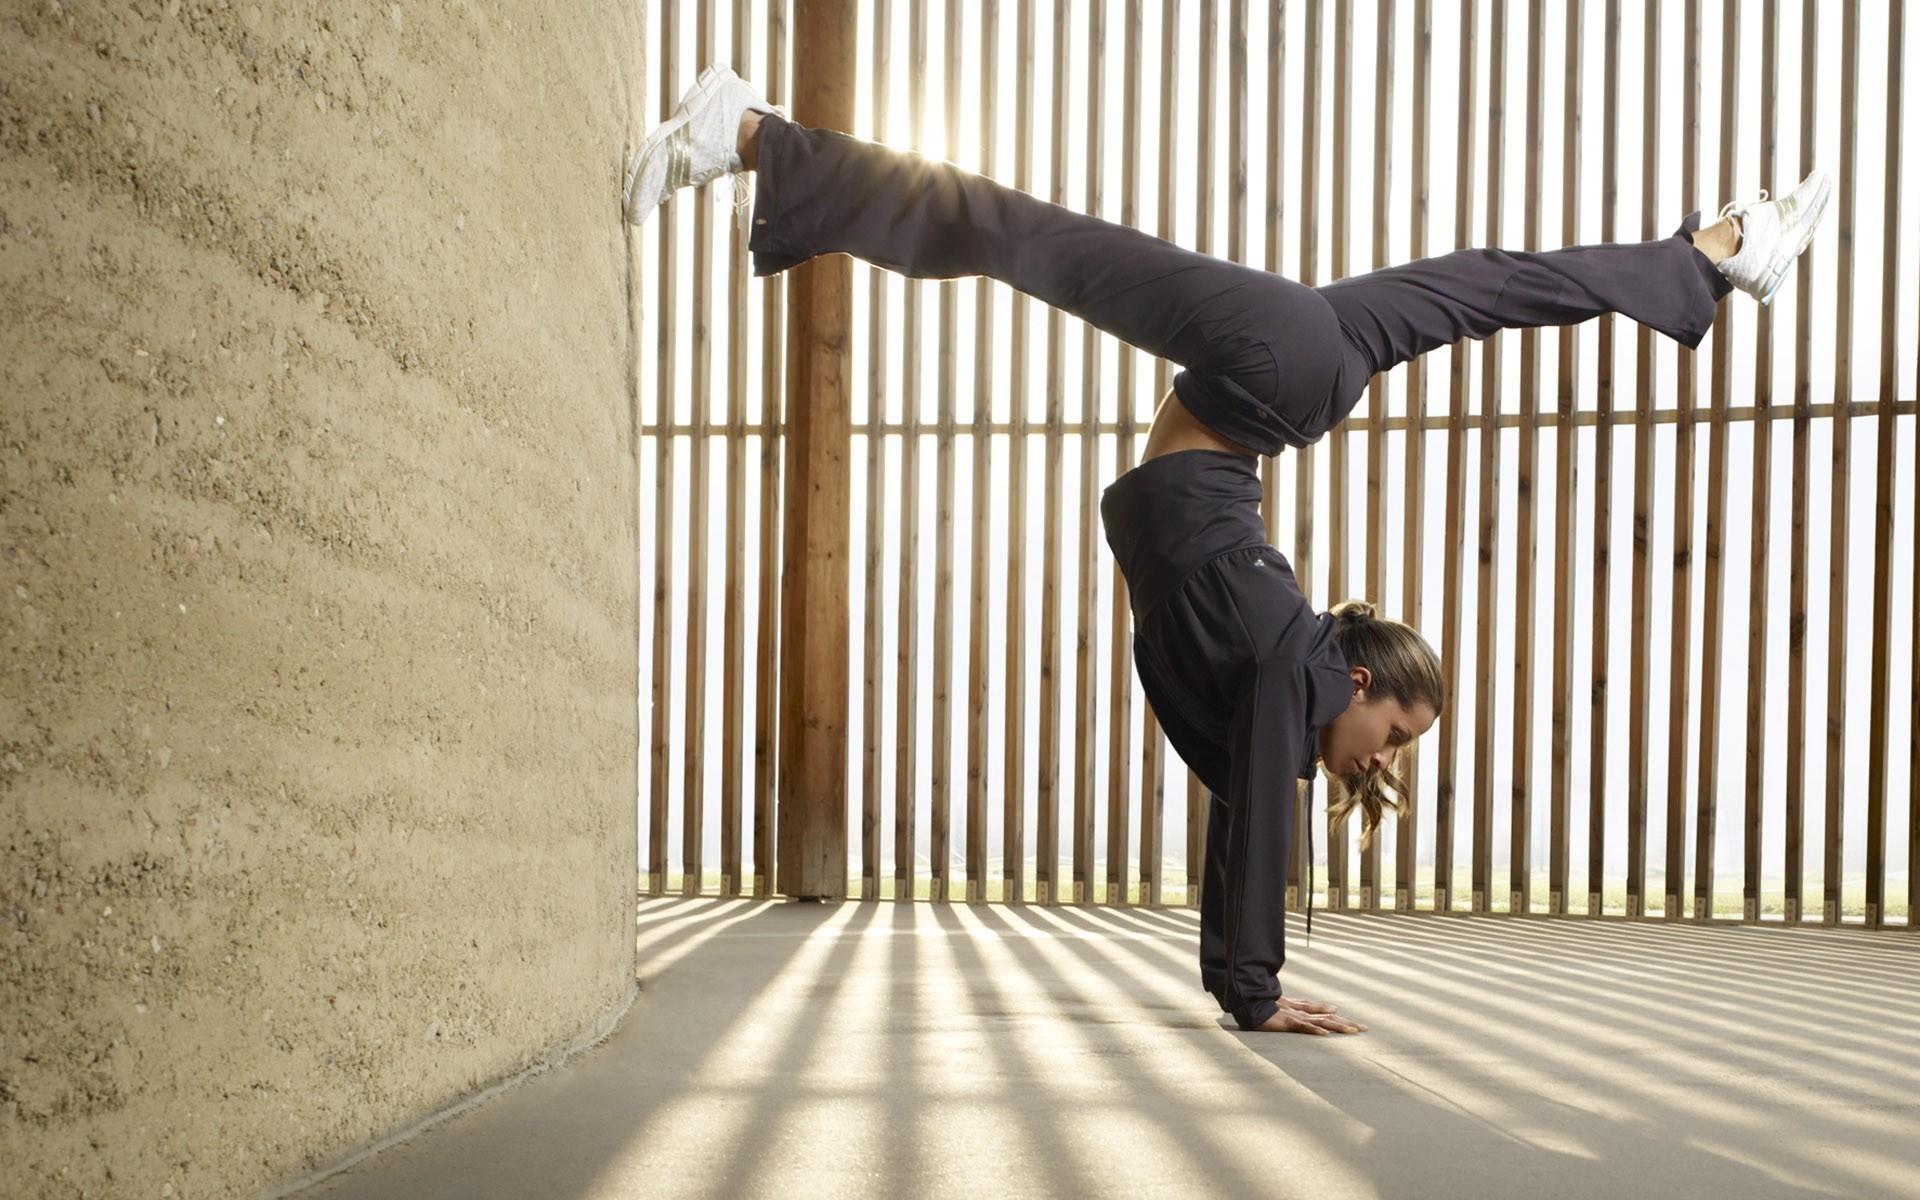 спортивная акробатика и психология